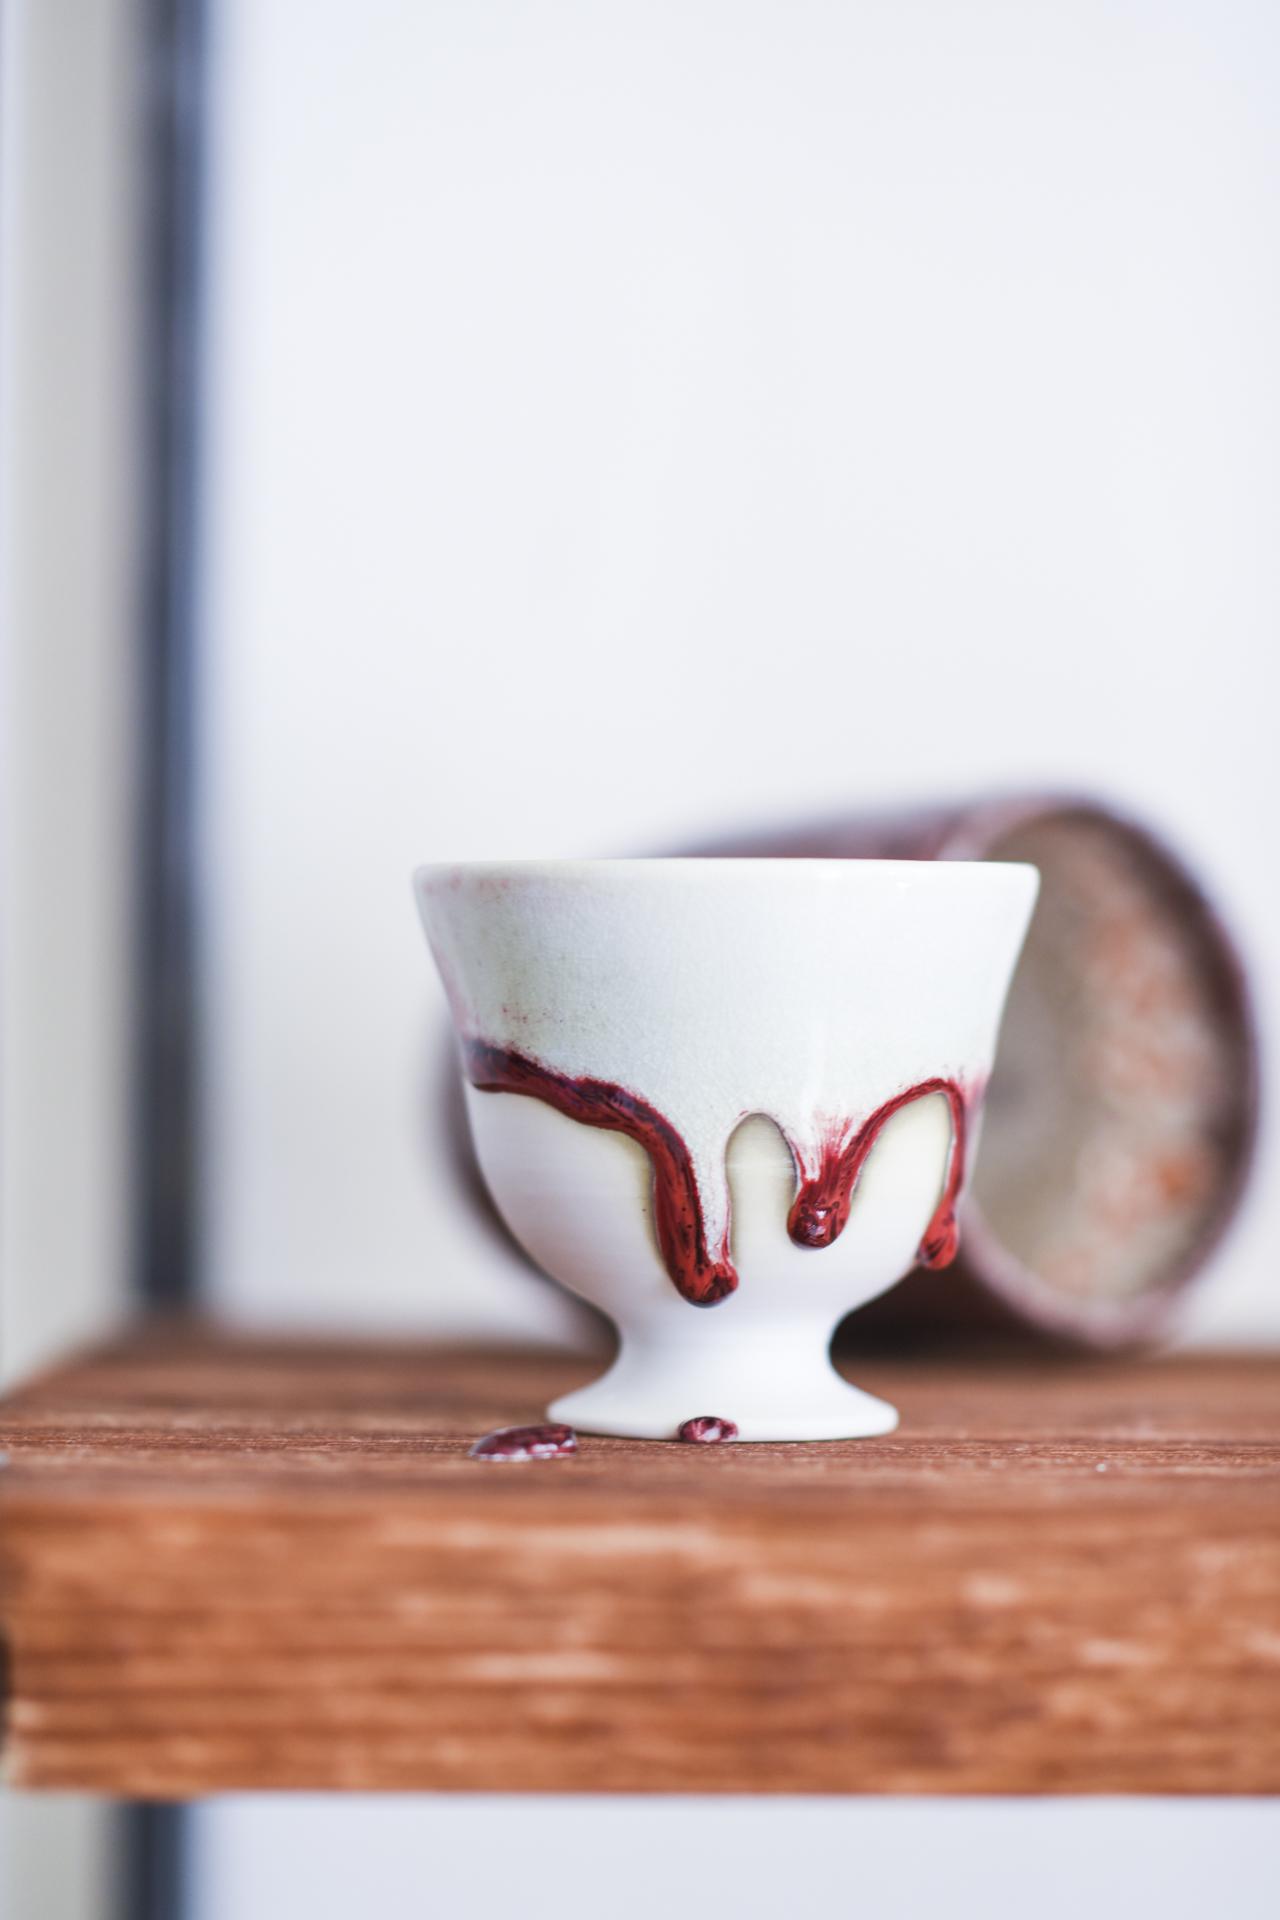 LB-keramik in bremgarten